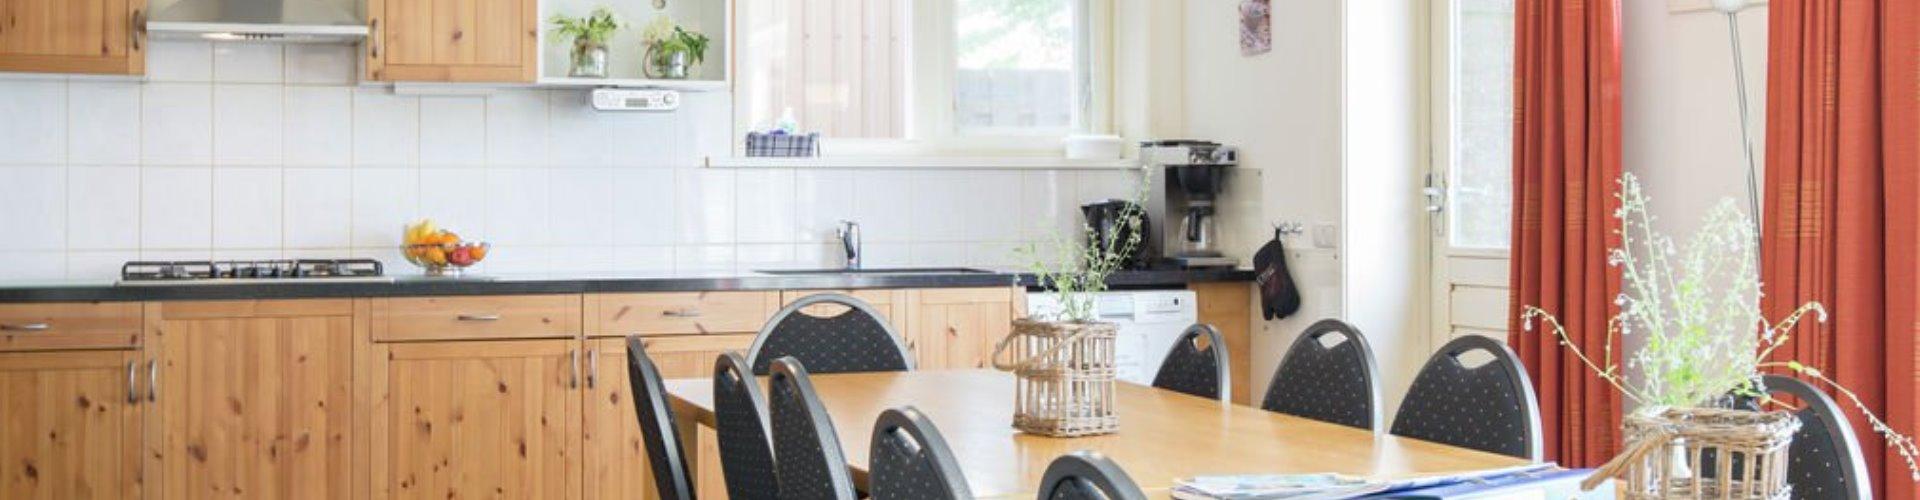 Ruime open keuken groepsaccommodatie friesland